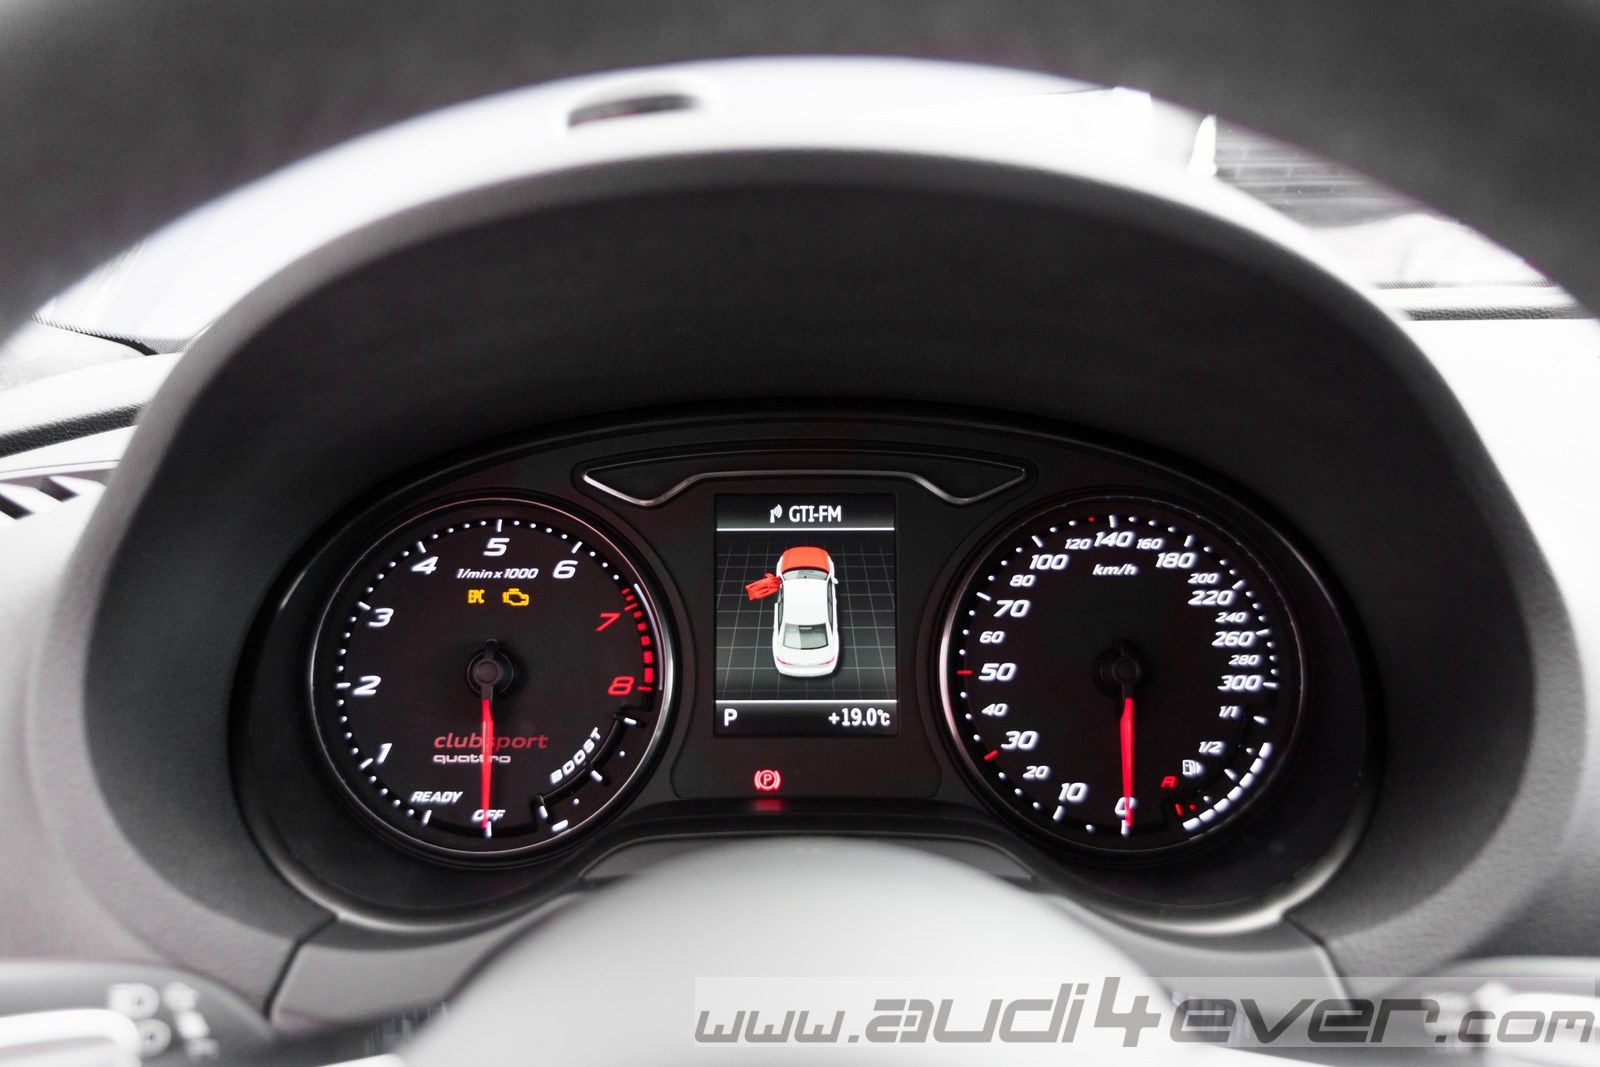 A4e Gallery Audi Concept Cars Audi A3 Clubsport